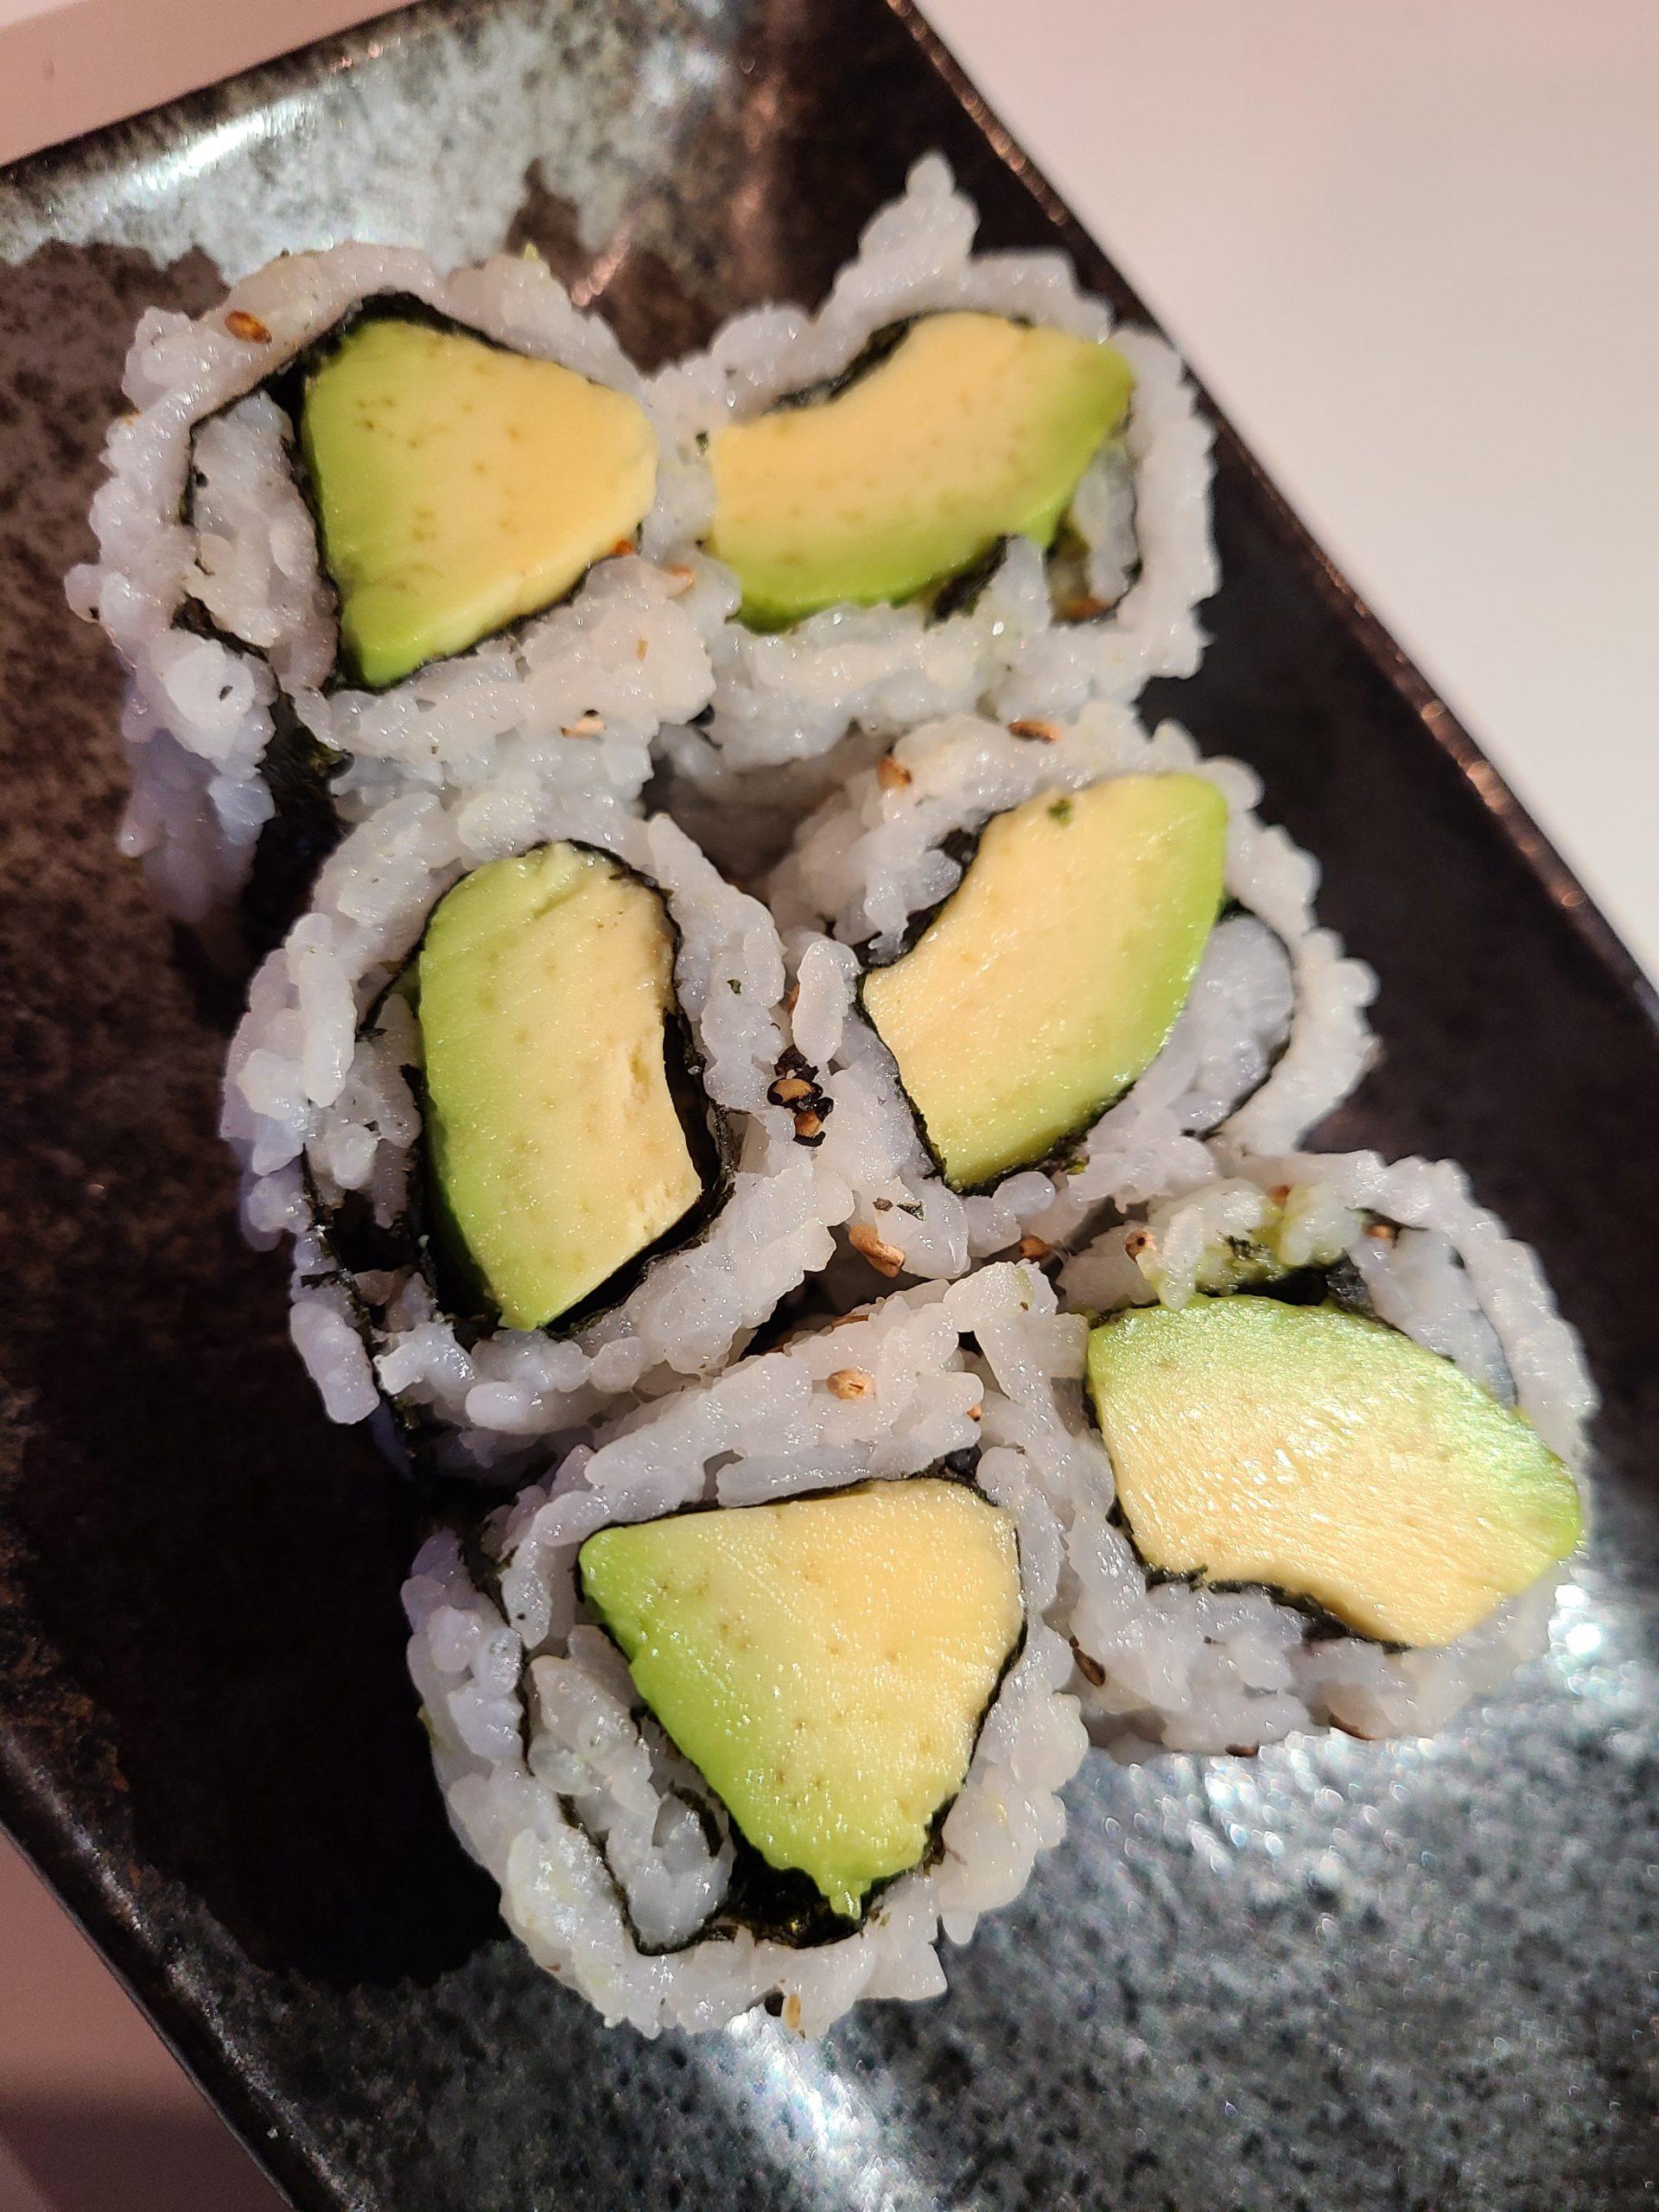 avo roll